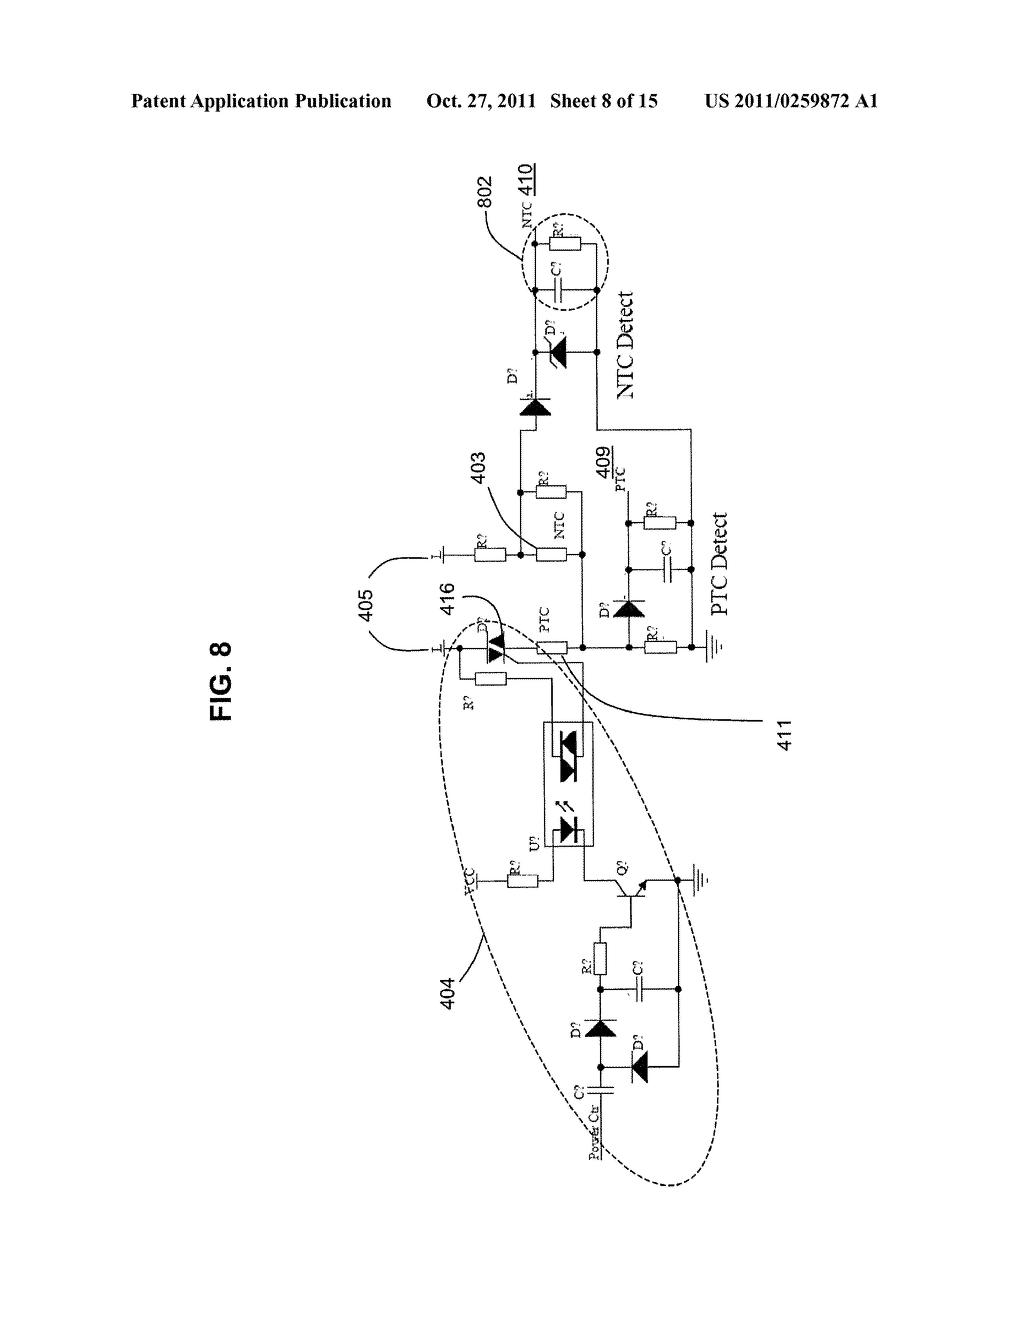 Wiring Diagram Heating Pad